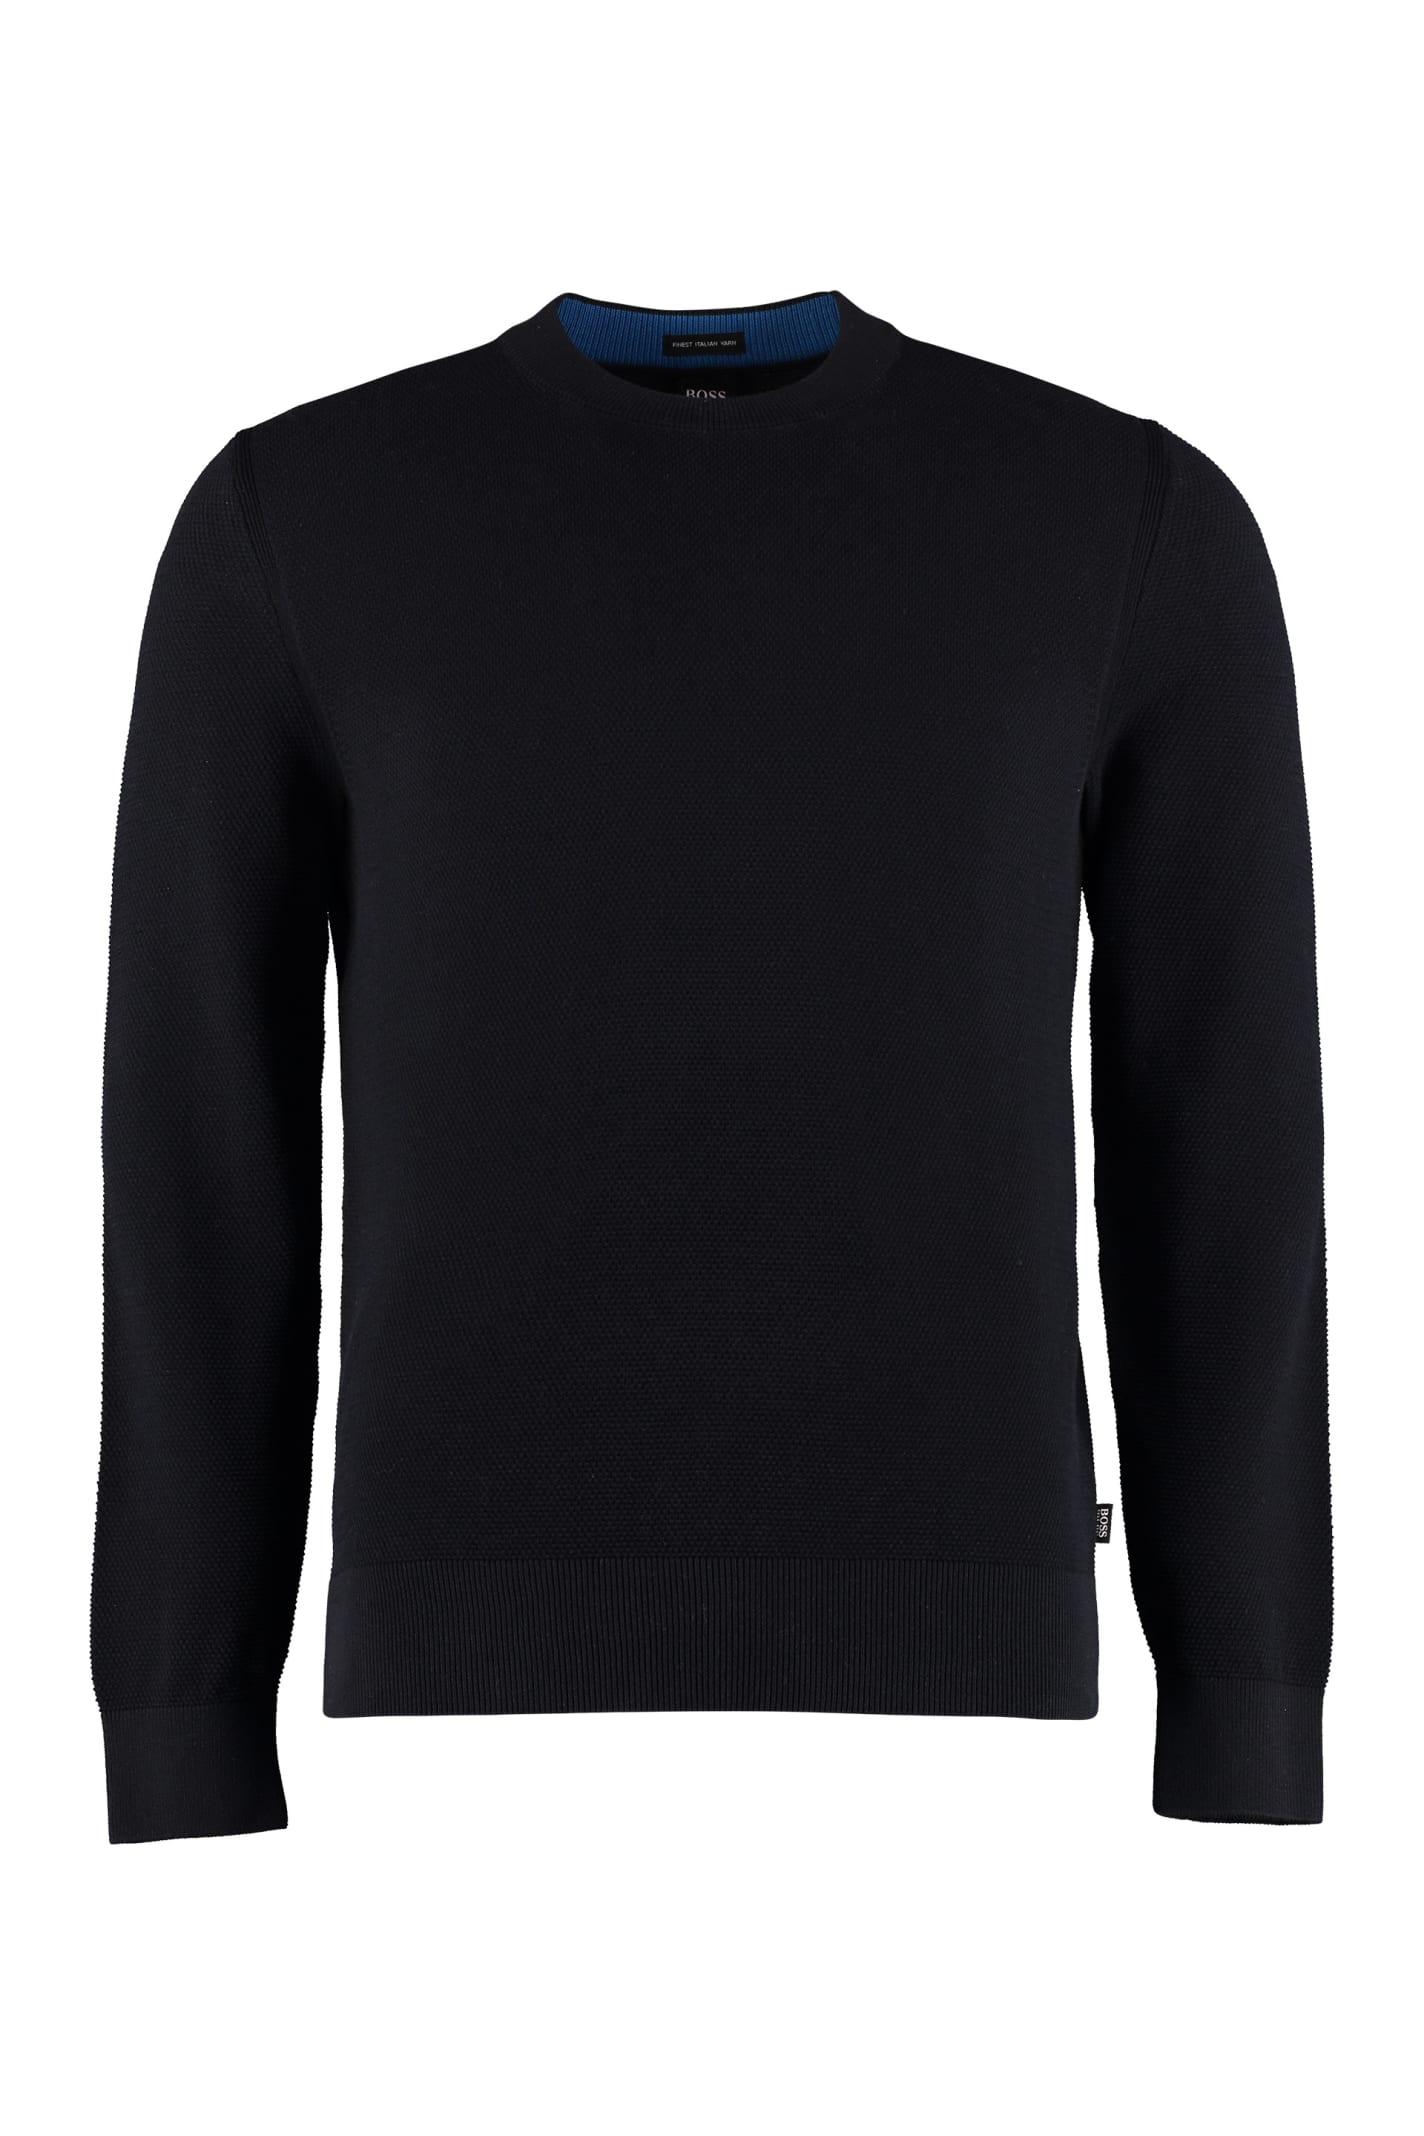 Hugo Boss Cotton Crew-neck Sweater